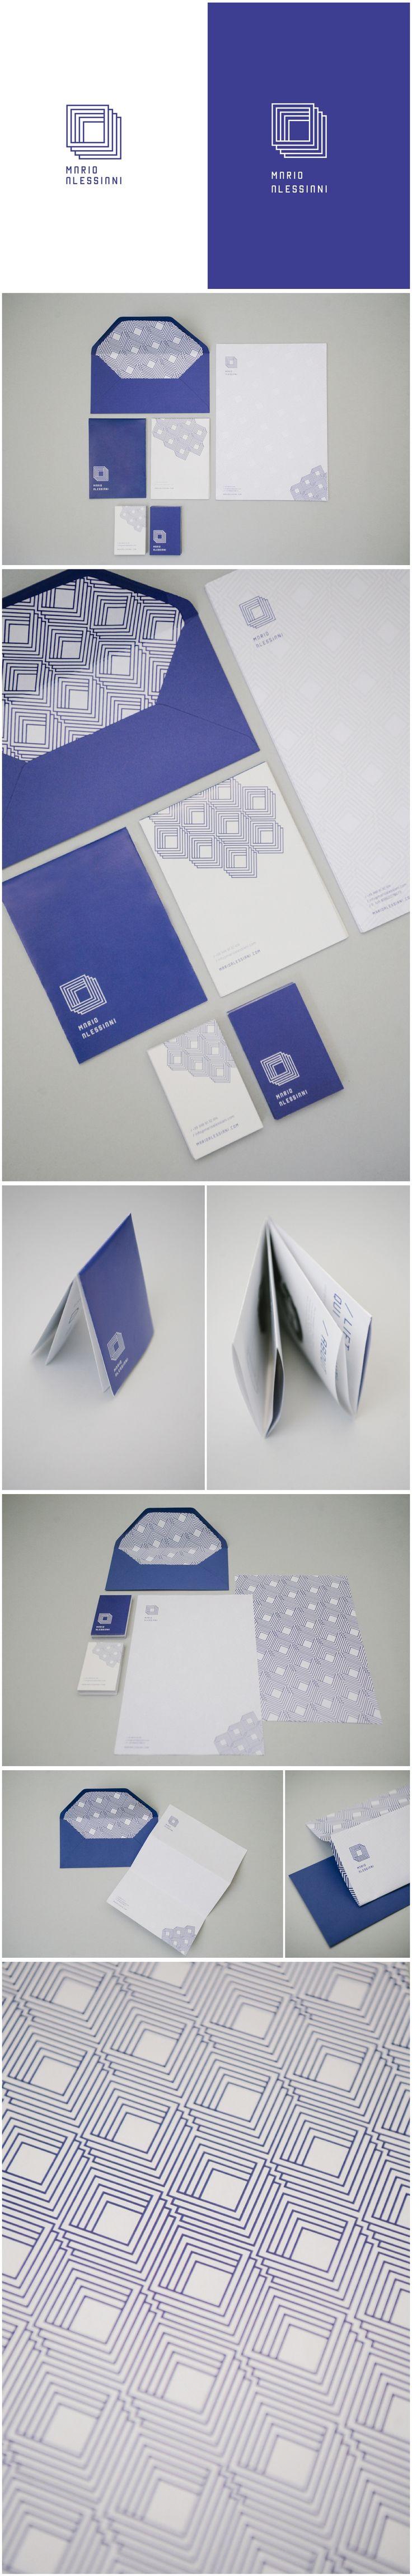 Mario Alessiani Design brand identity. Geometry, minimal, blue. #brand #brandidentity #logodesign